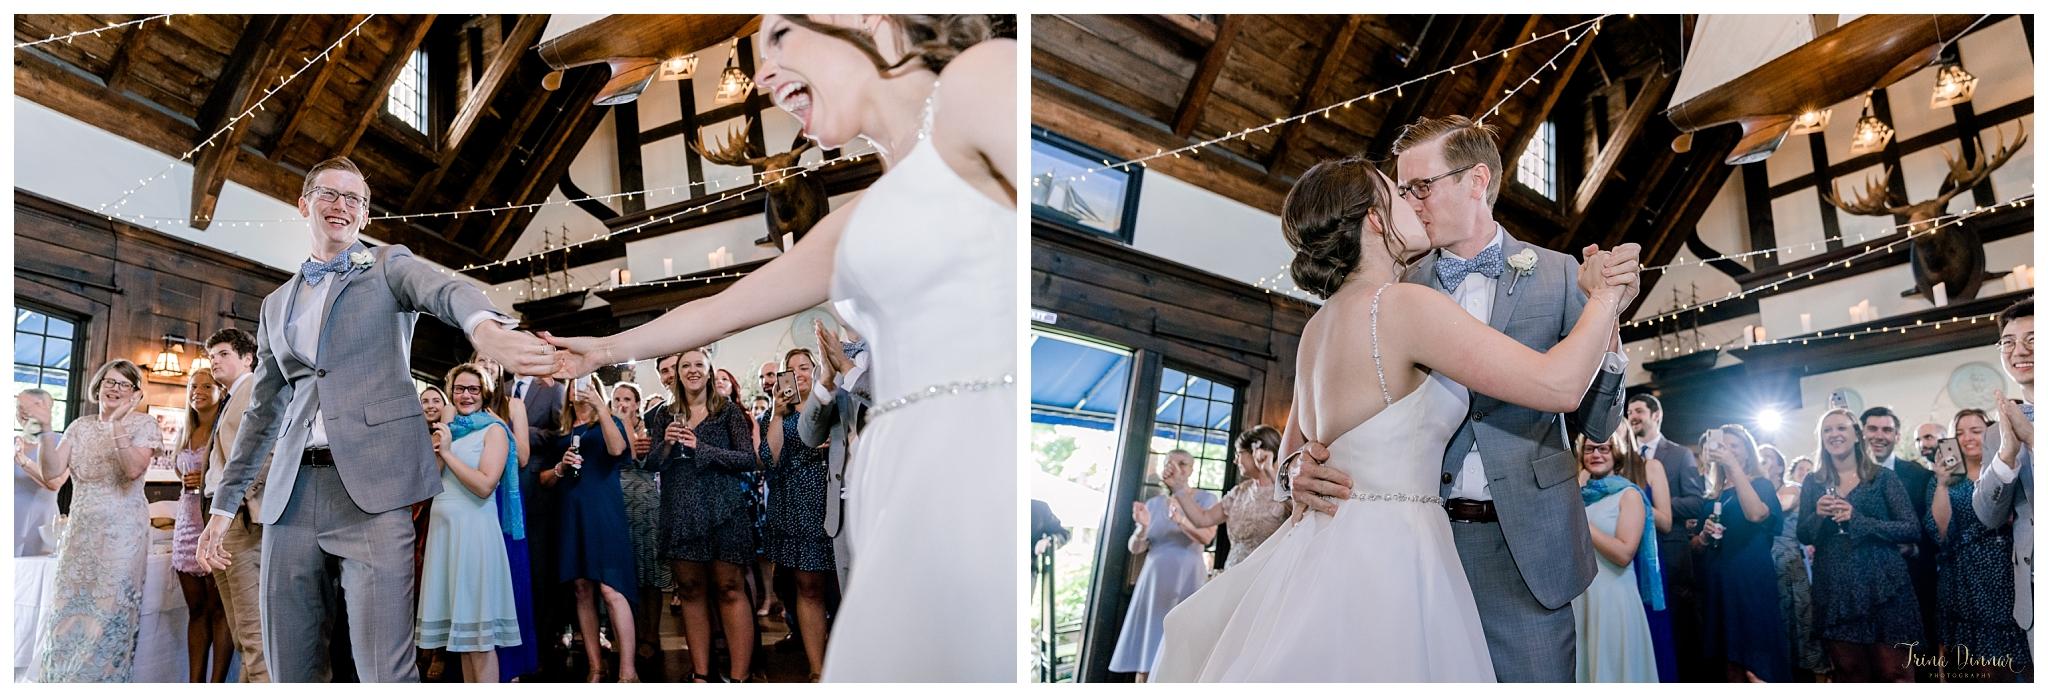 Megan and Hugh's Wedding Reception Grand Entrance